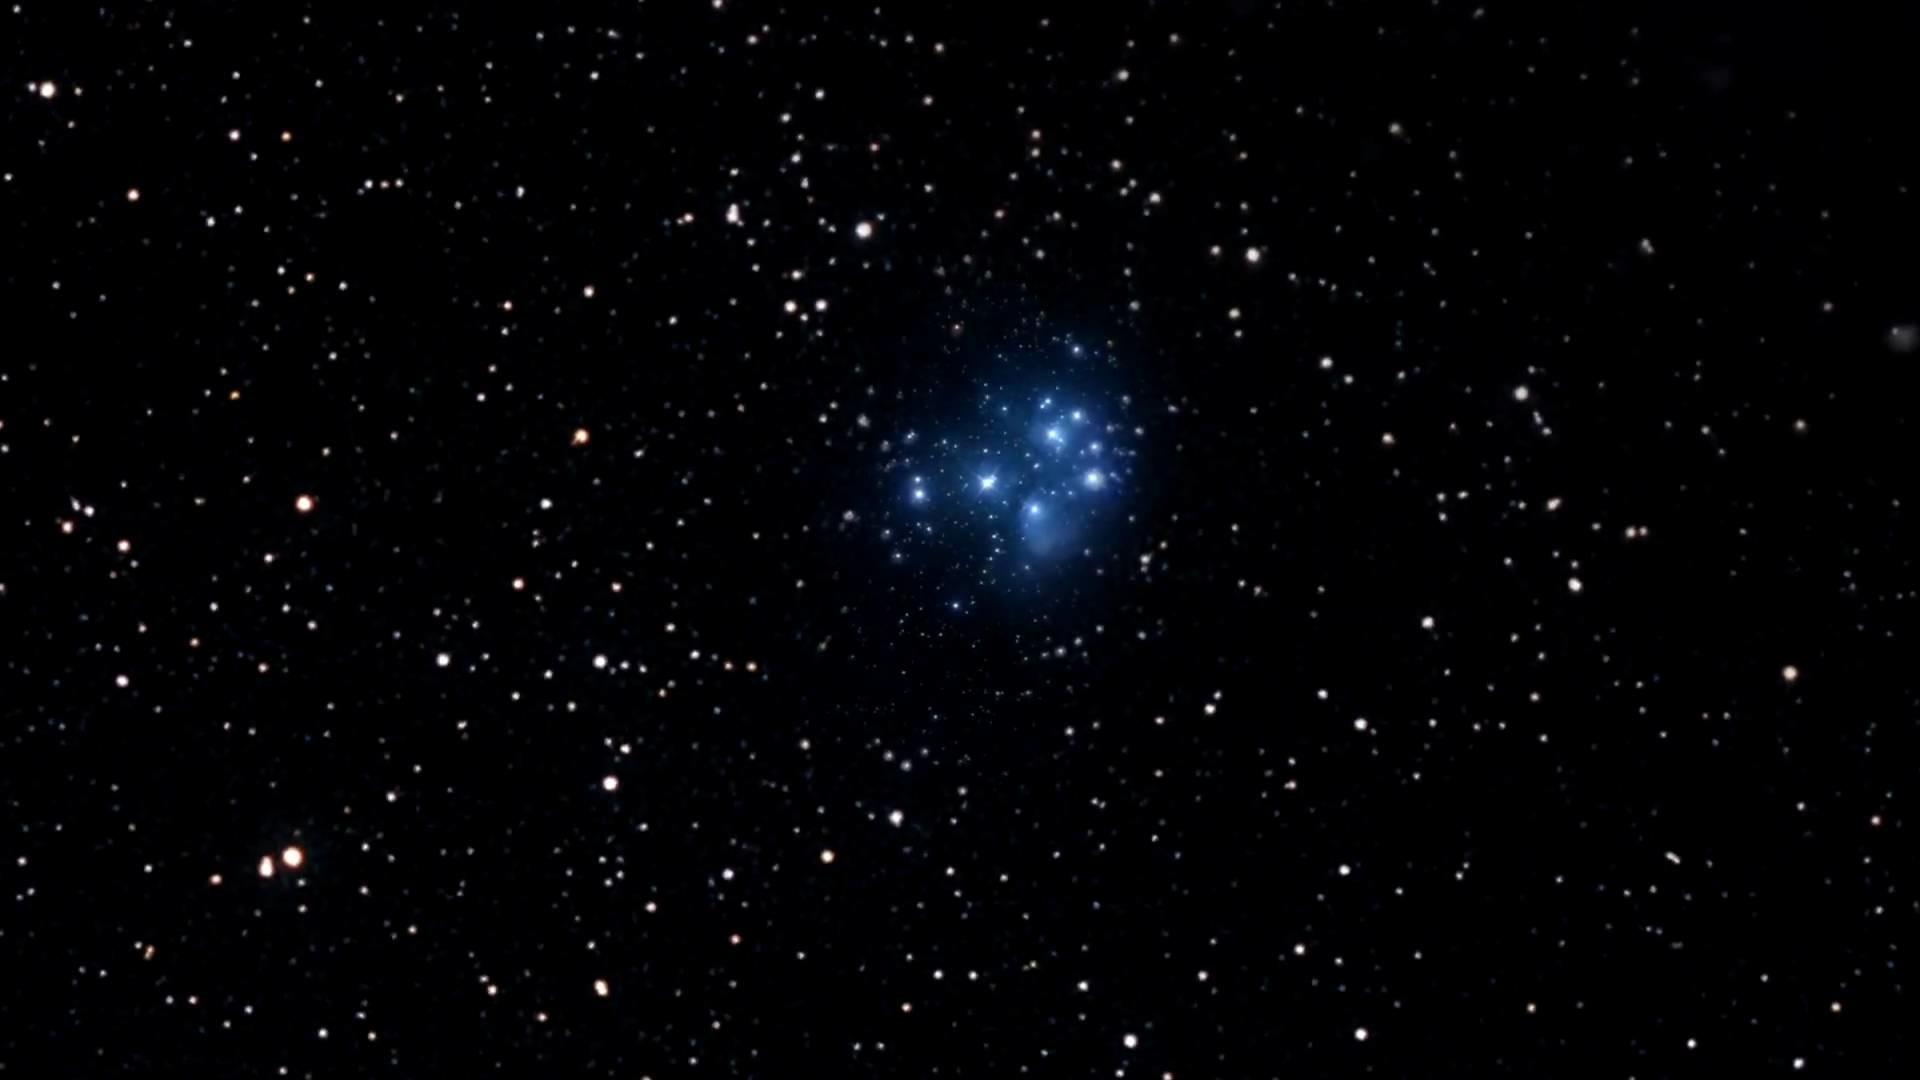 An Astonishing Image of the Pleiades (and Far Beyond